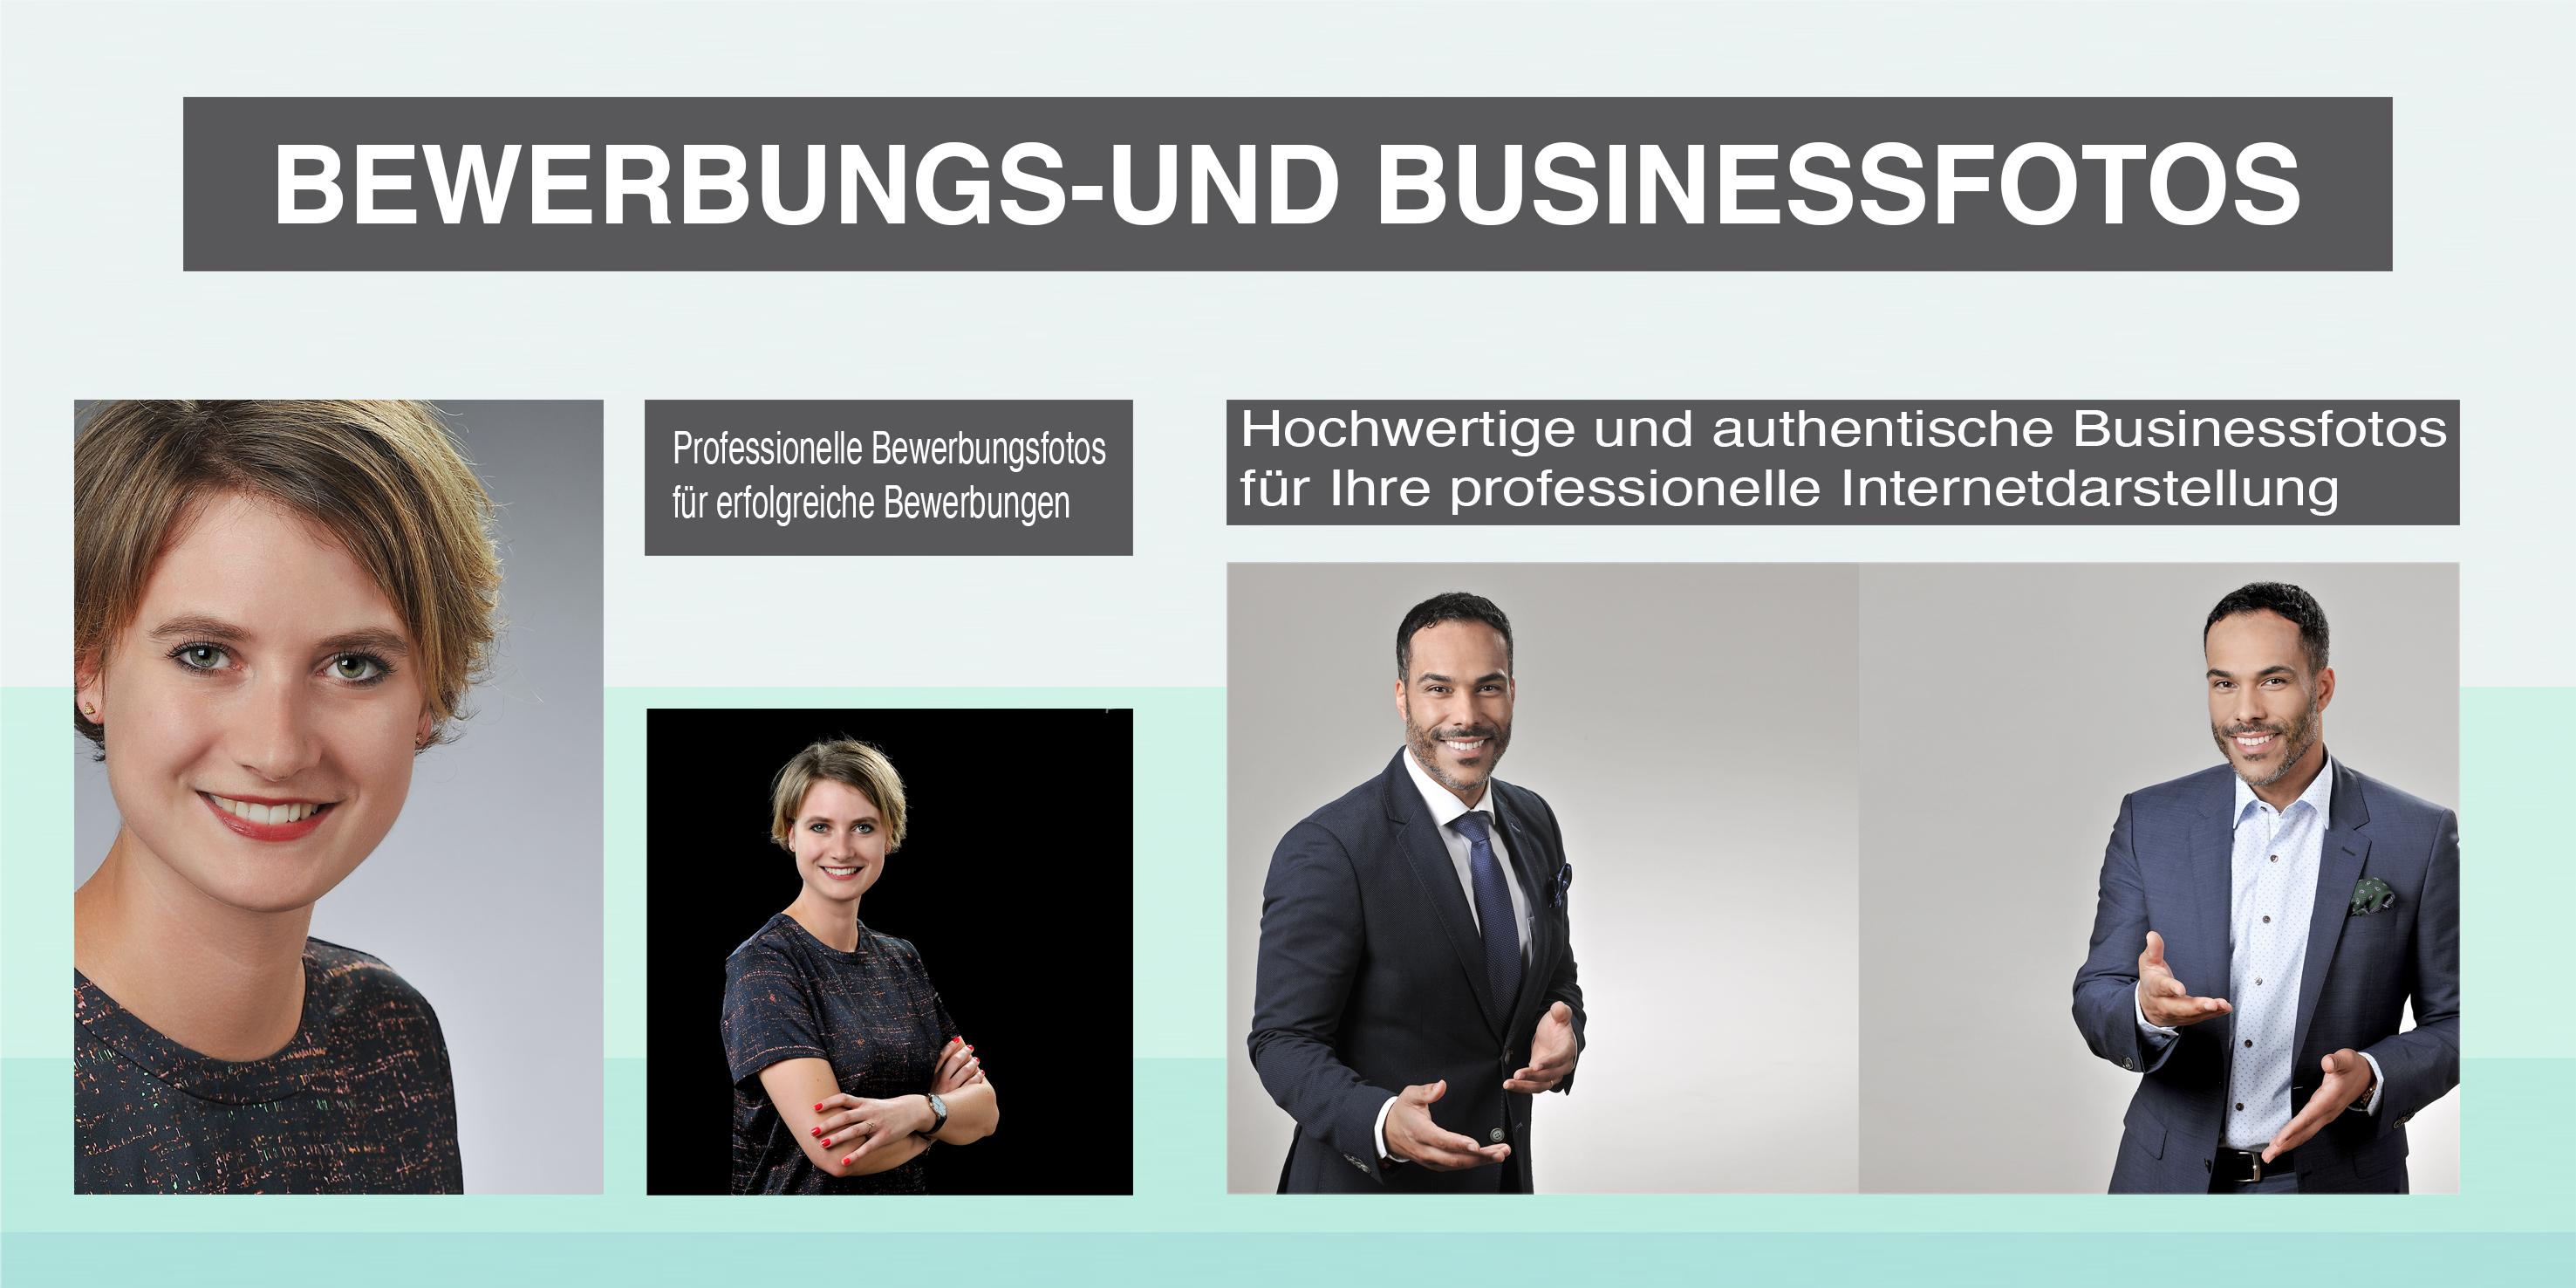 Bewerbung / Business